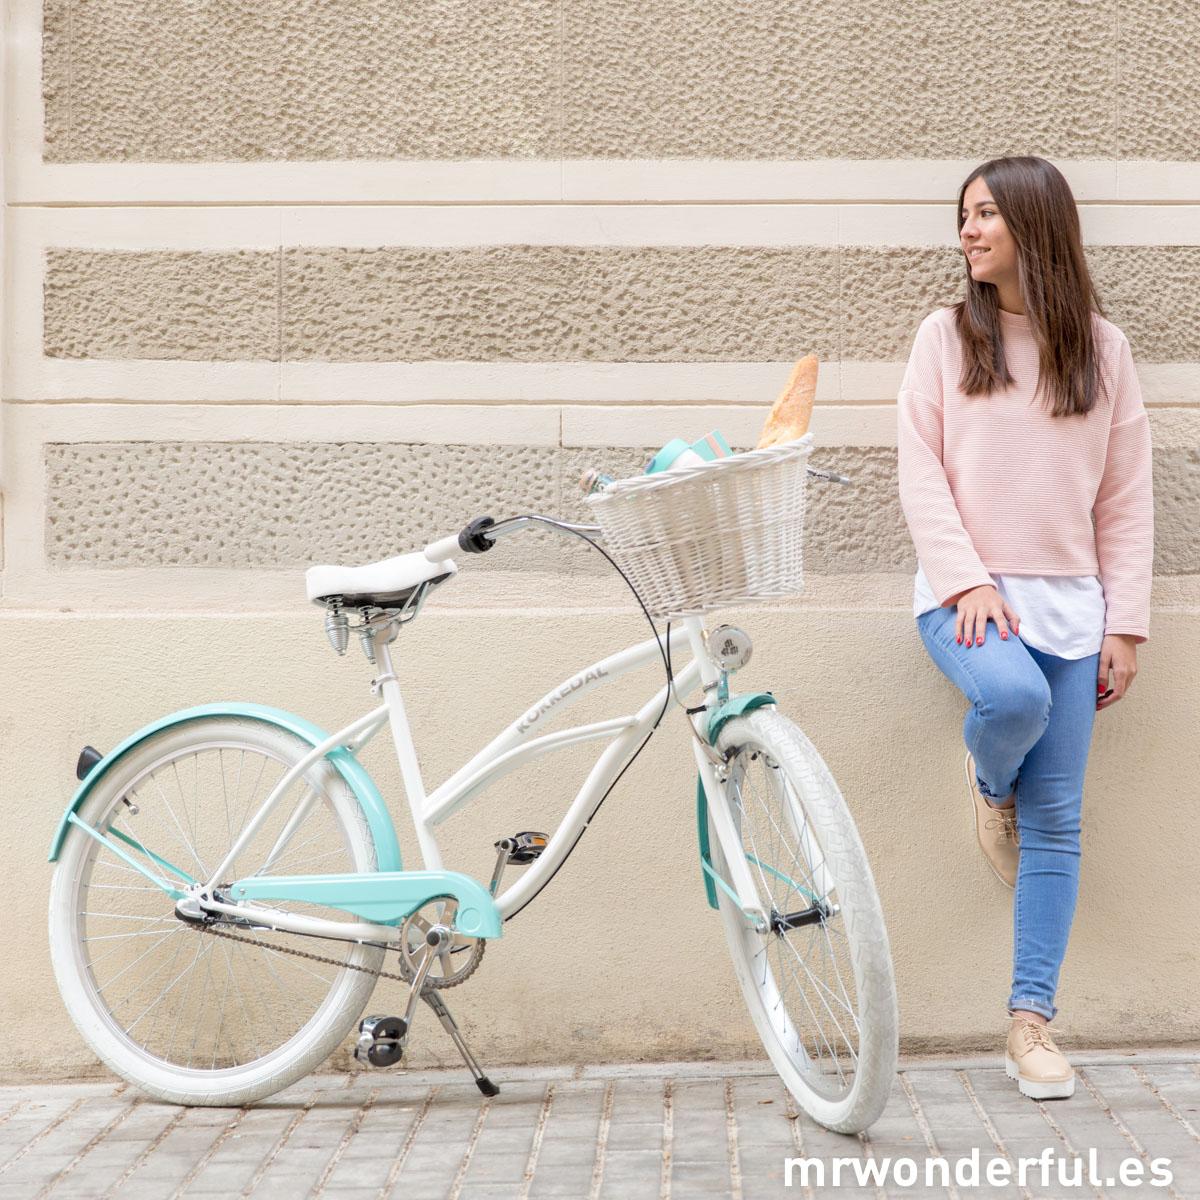 mrwonderful_concurso-bici-favoritebike-2016-38-Editar-Editar